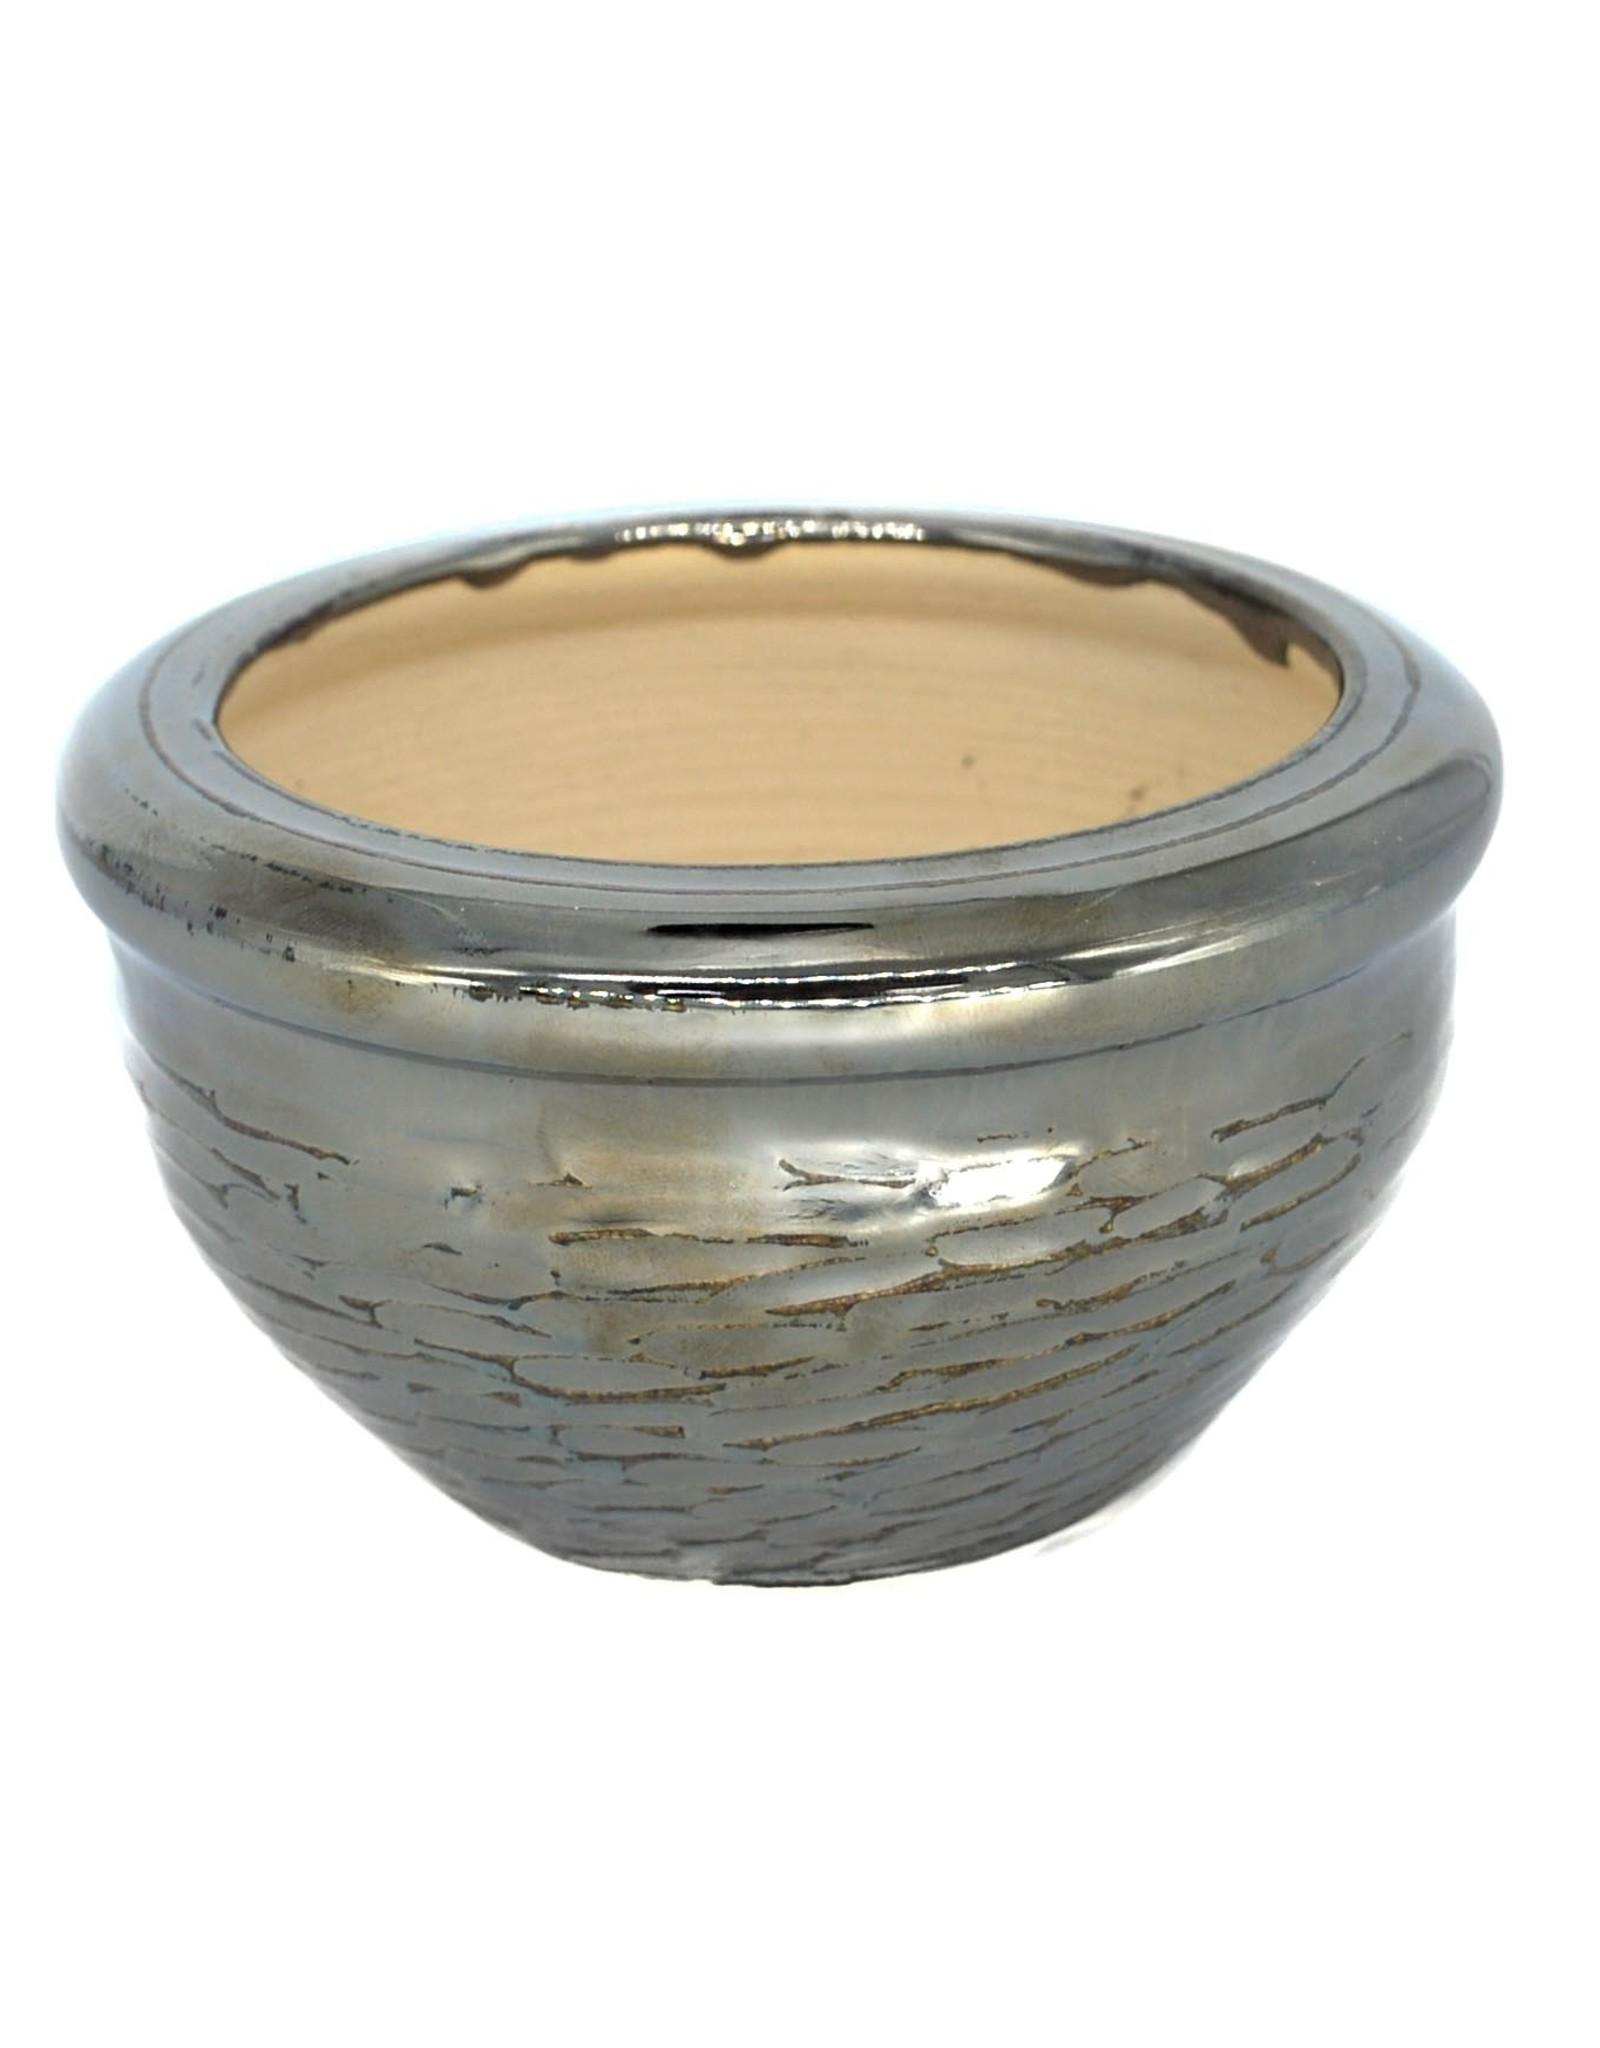 Metallic silver faceted ceramic plant pot by Ronda Ruby Ceramics